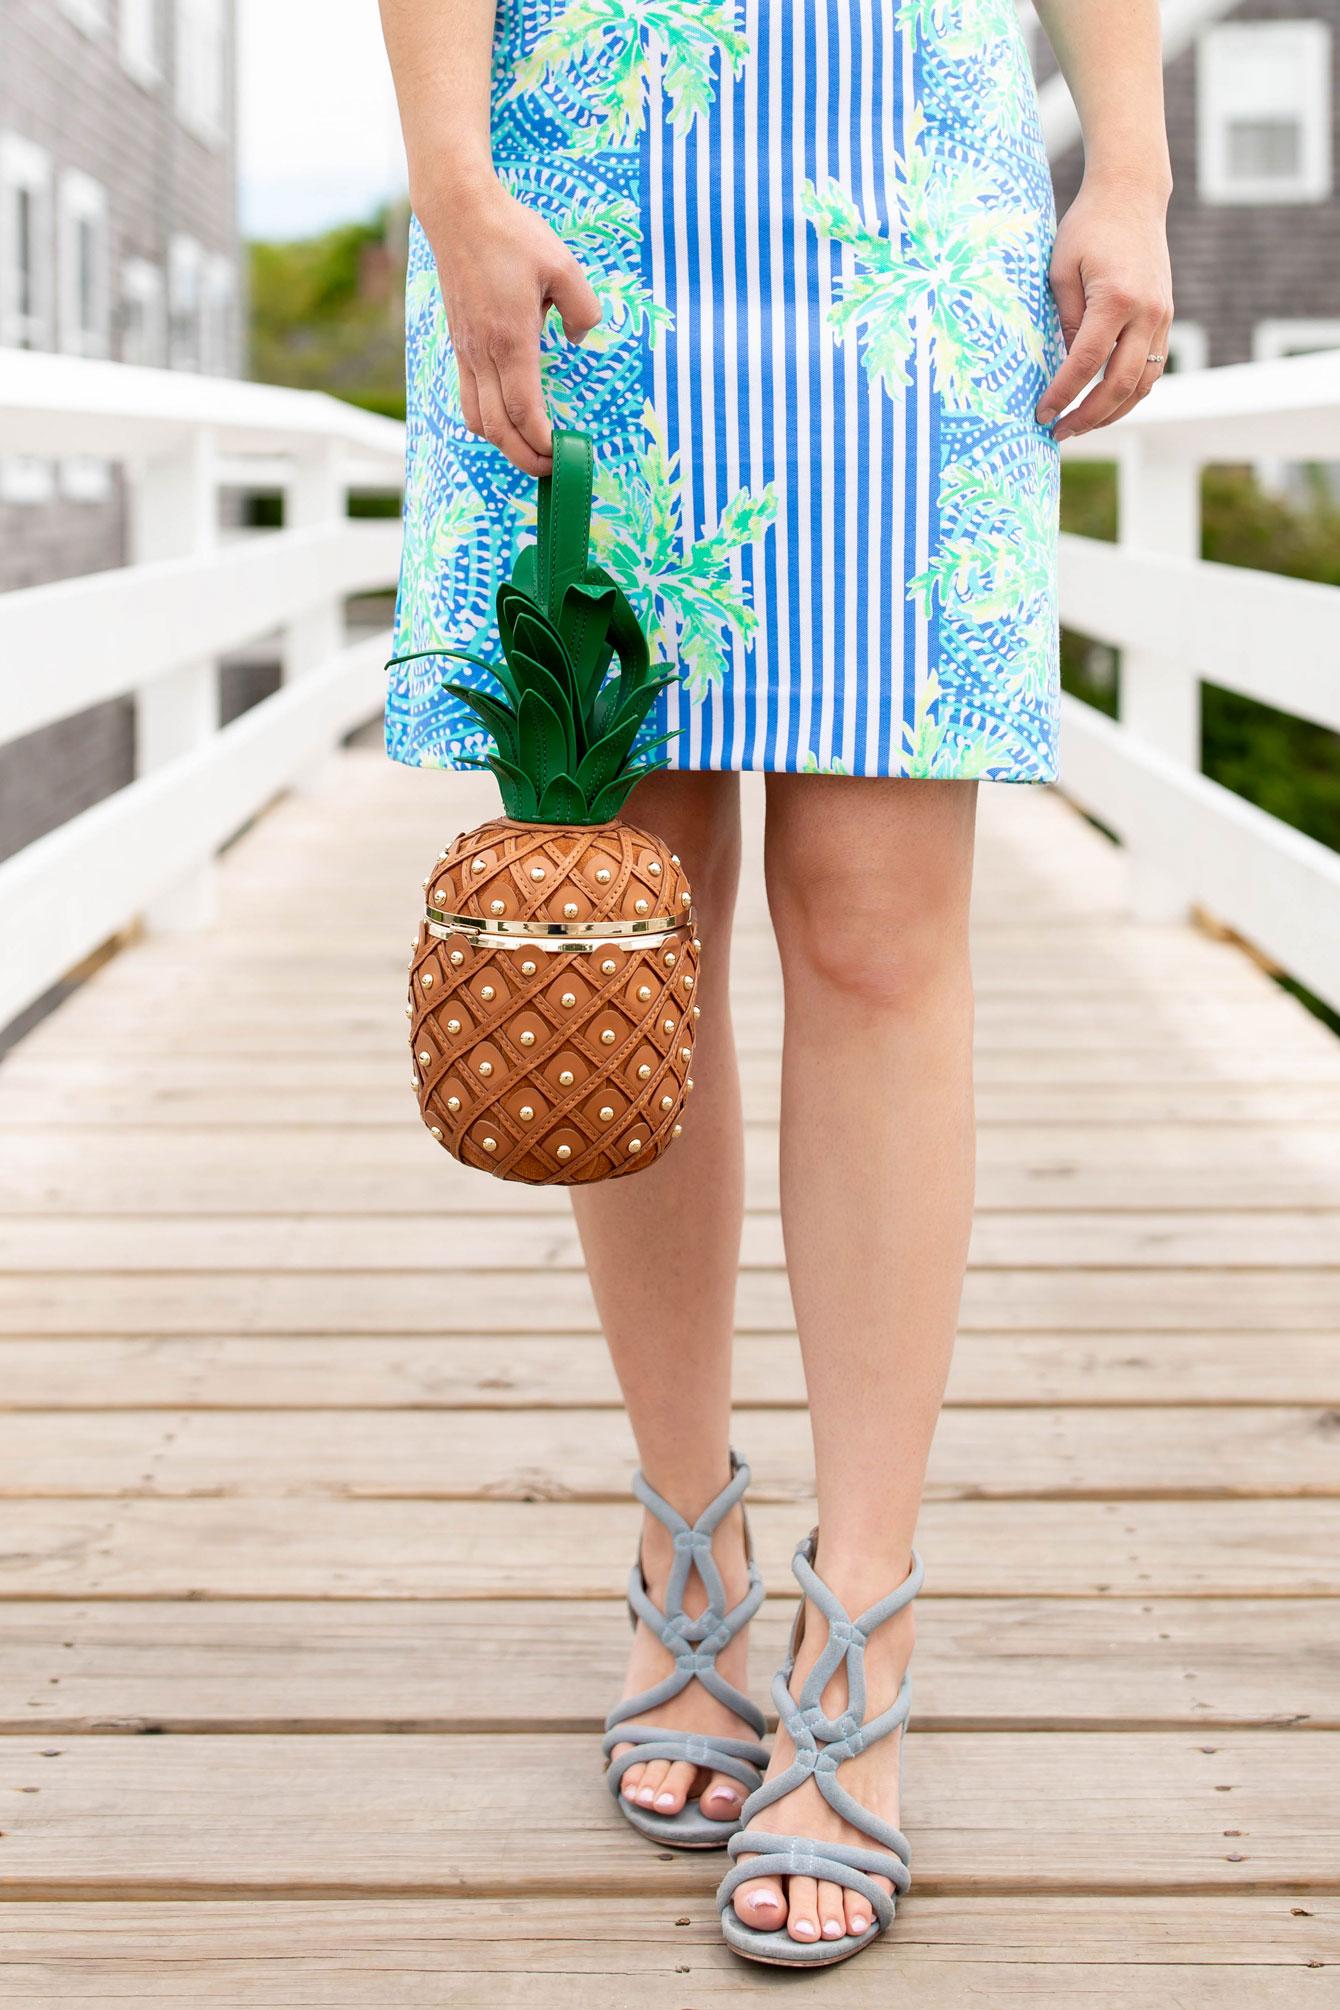 Kate Spade Pineapple Bag